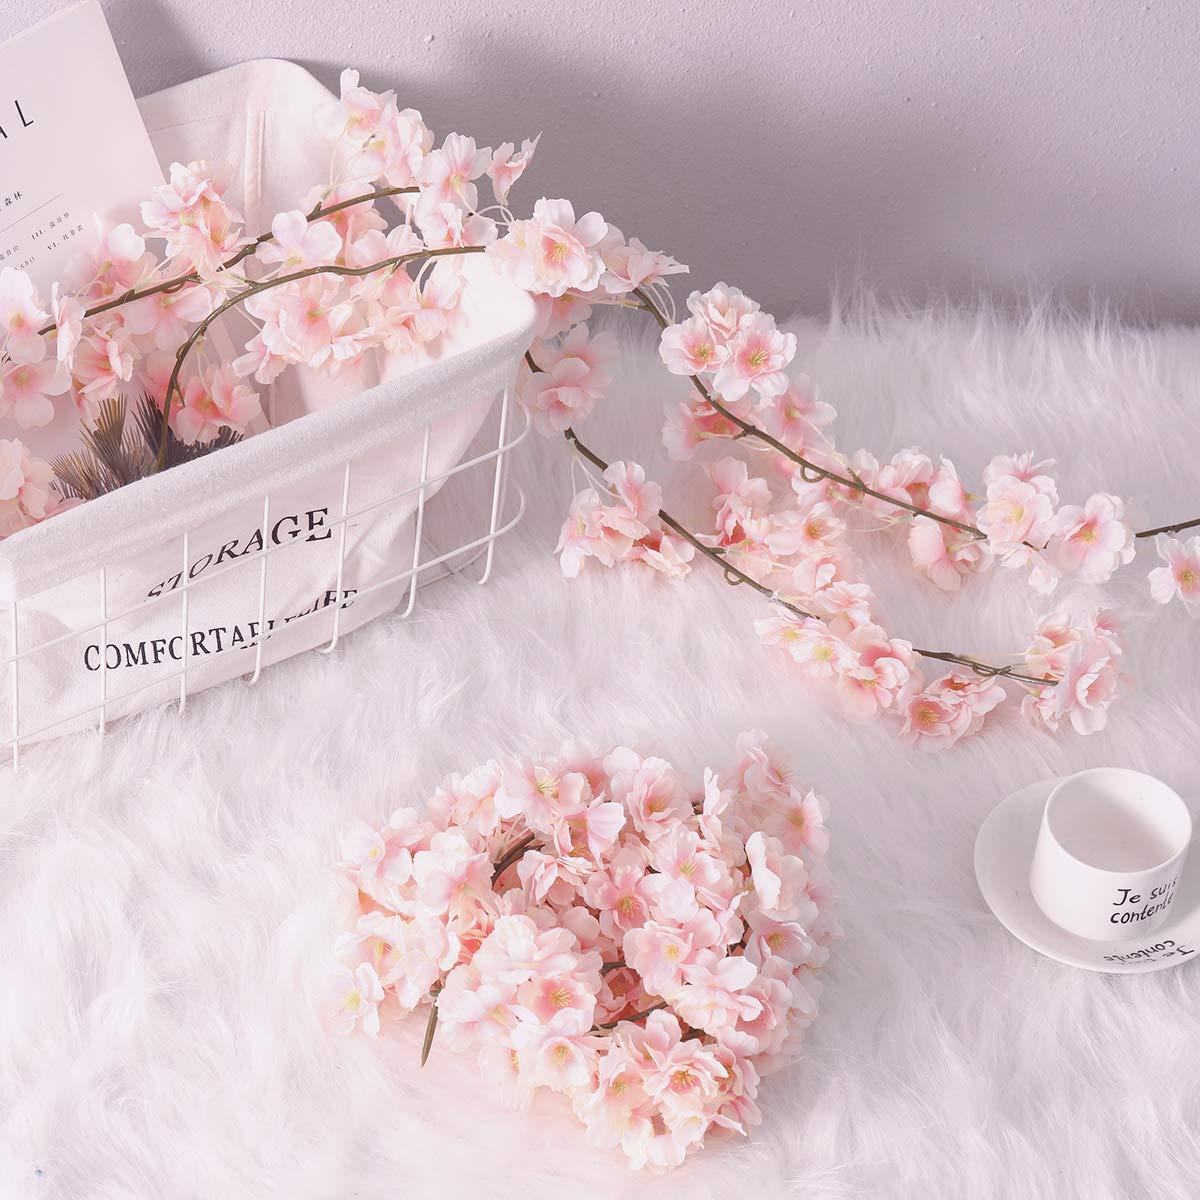 2, Pink PARTY JOY Artificial Cherry Blossom Garland Hanging Vine Silk Garland Wedding Party Decor,